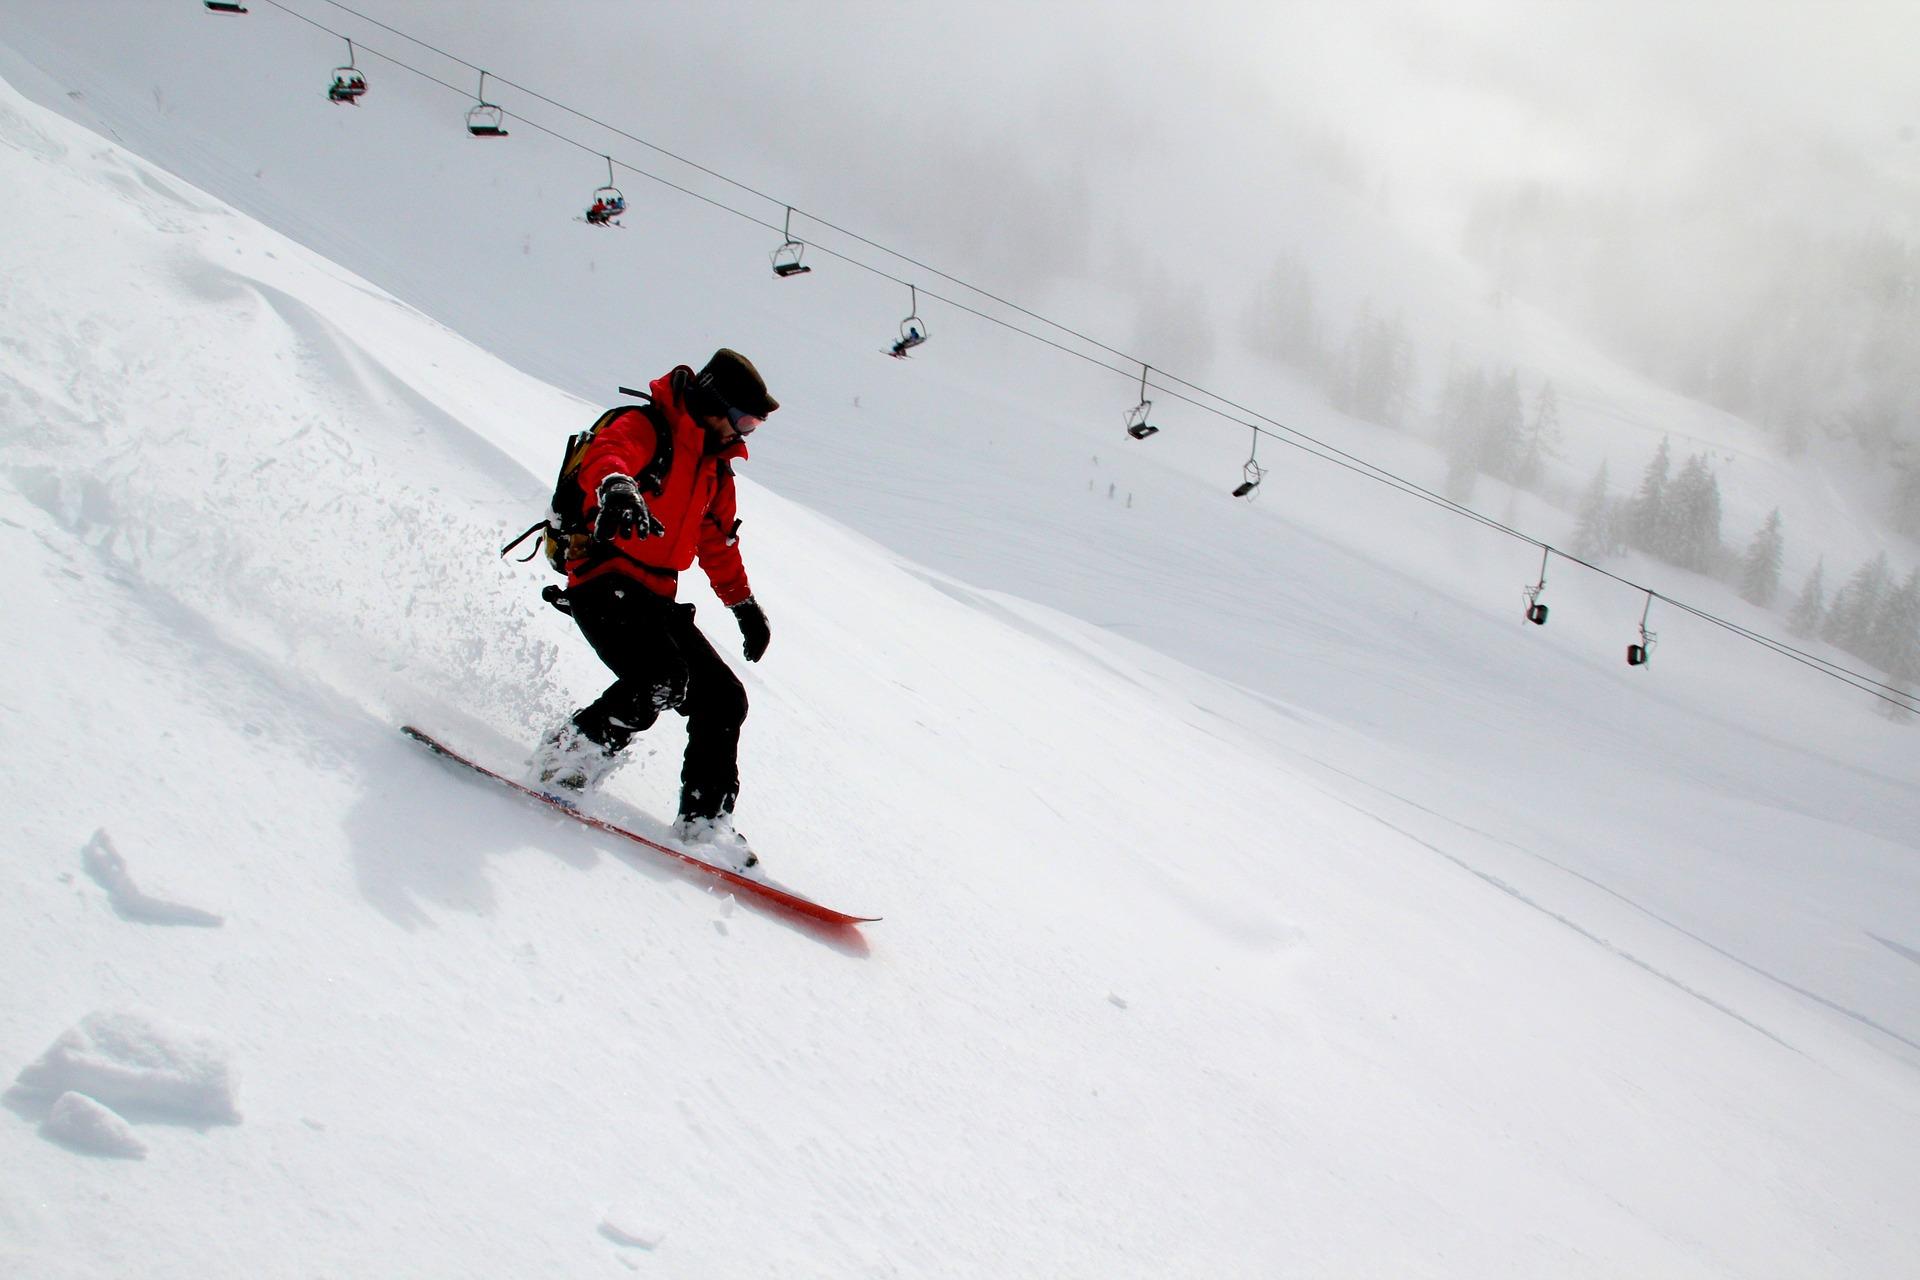 snowboarding-554048_1920